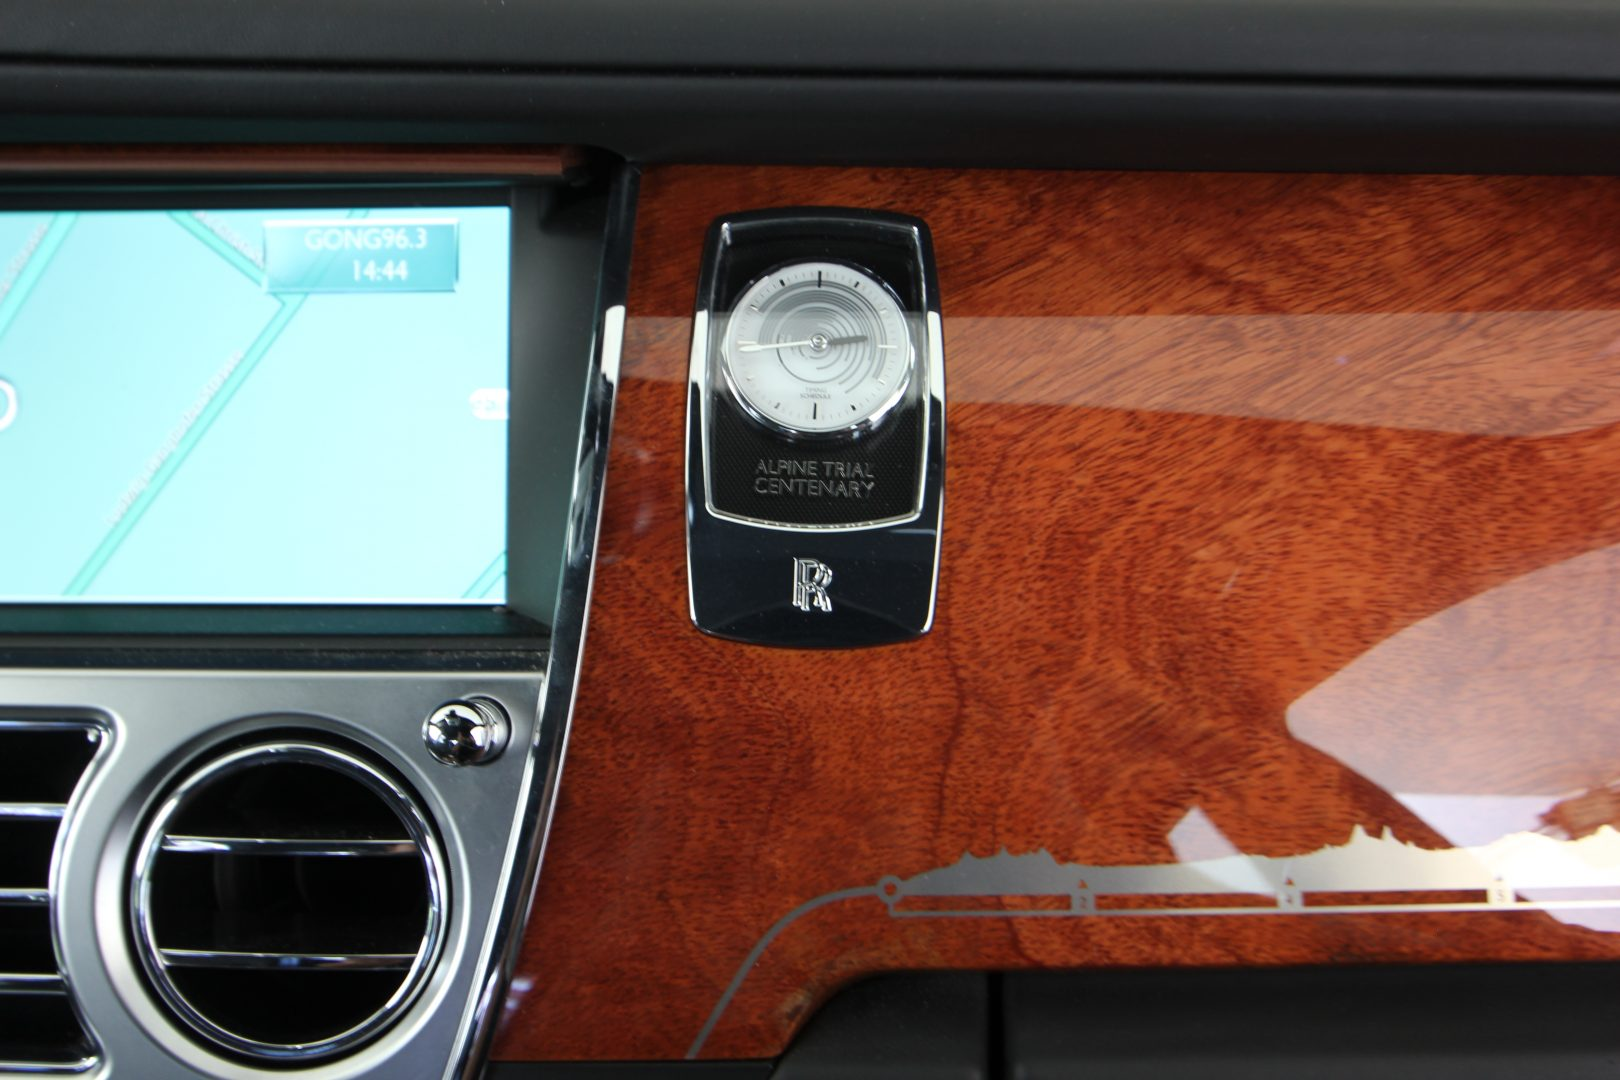 AIL Rolls Royce Ghost Alpine Trial 1